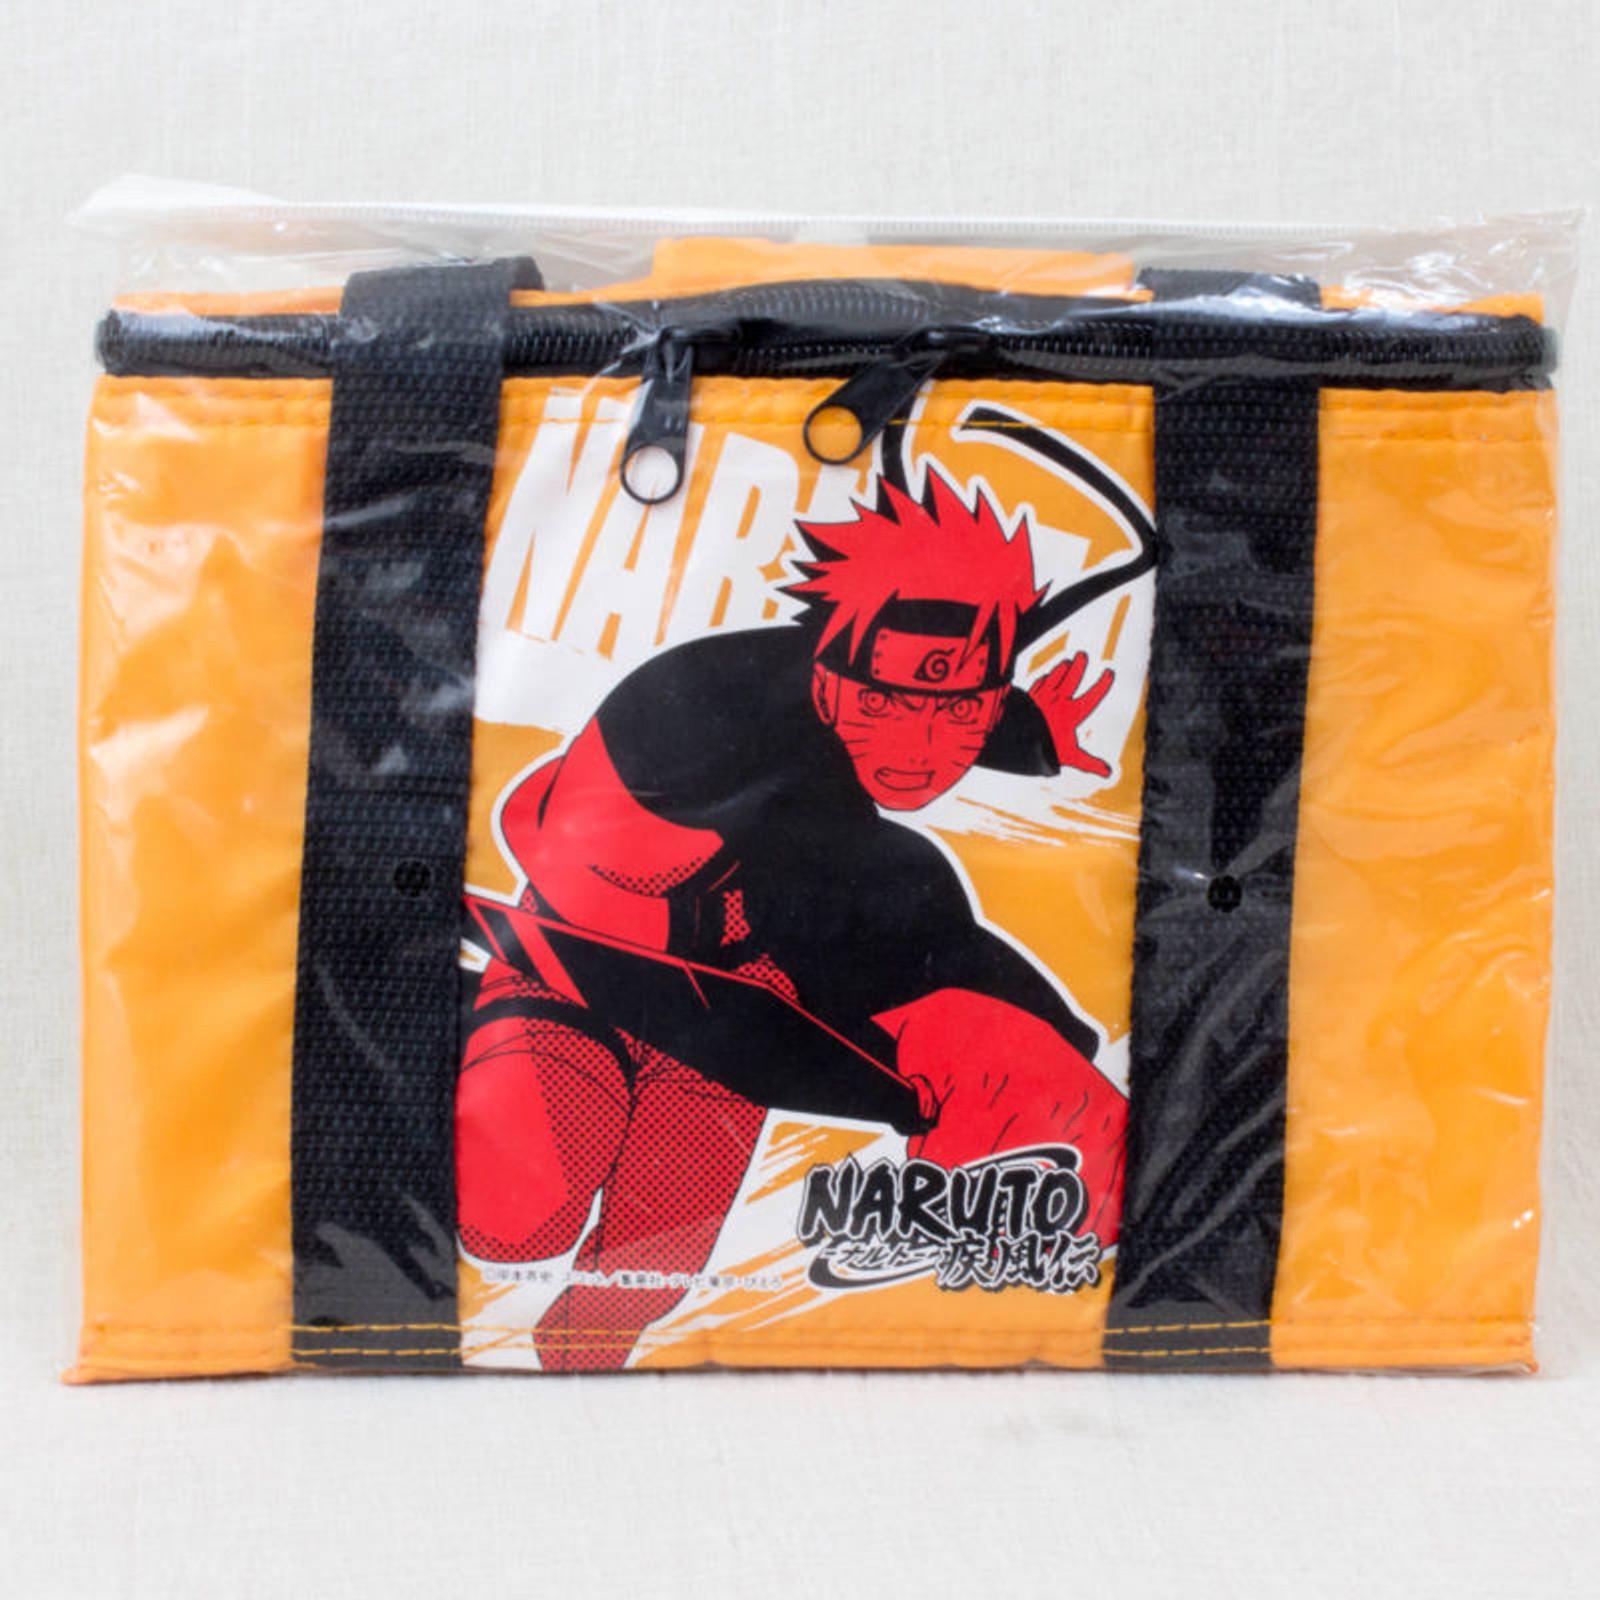 NARUTO Shippuden Naruto Uzumaki Cooler Bag JAPAN ANIME JUMP